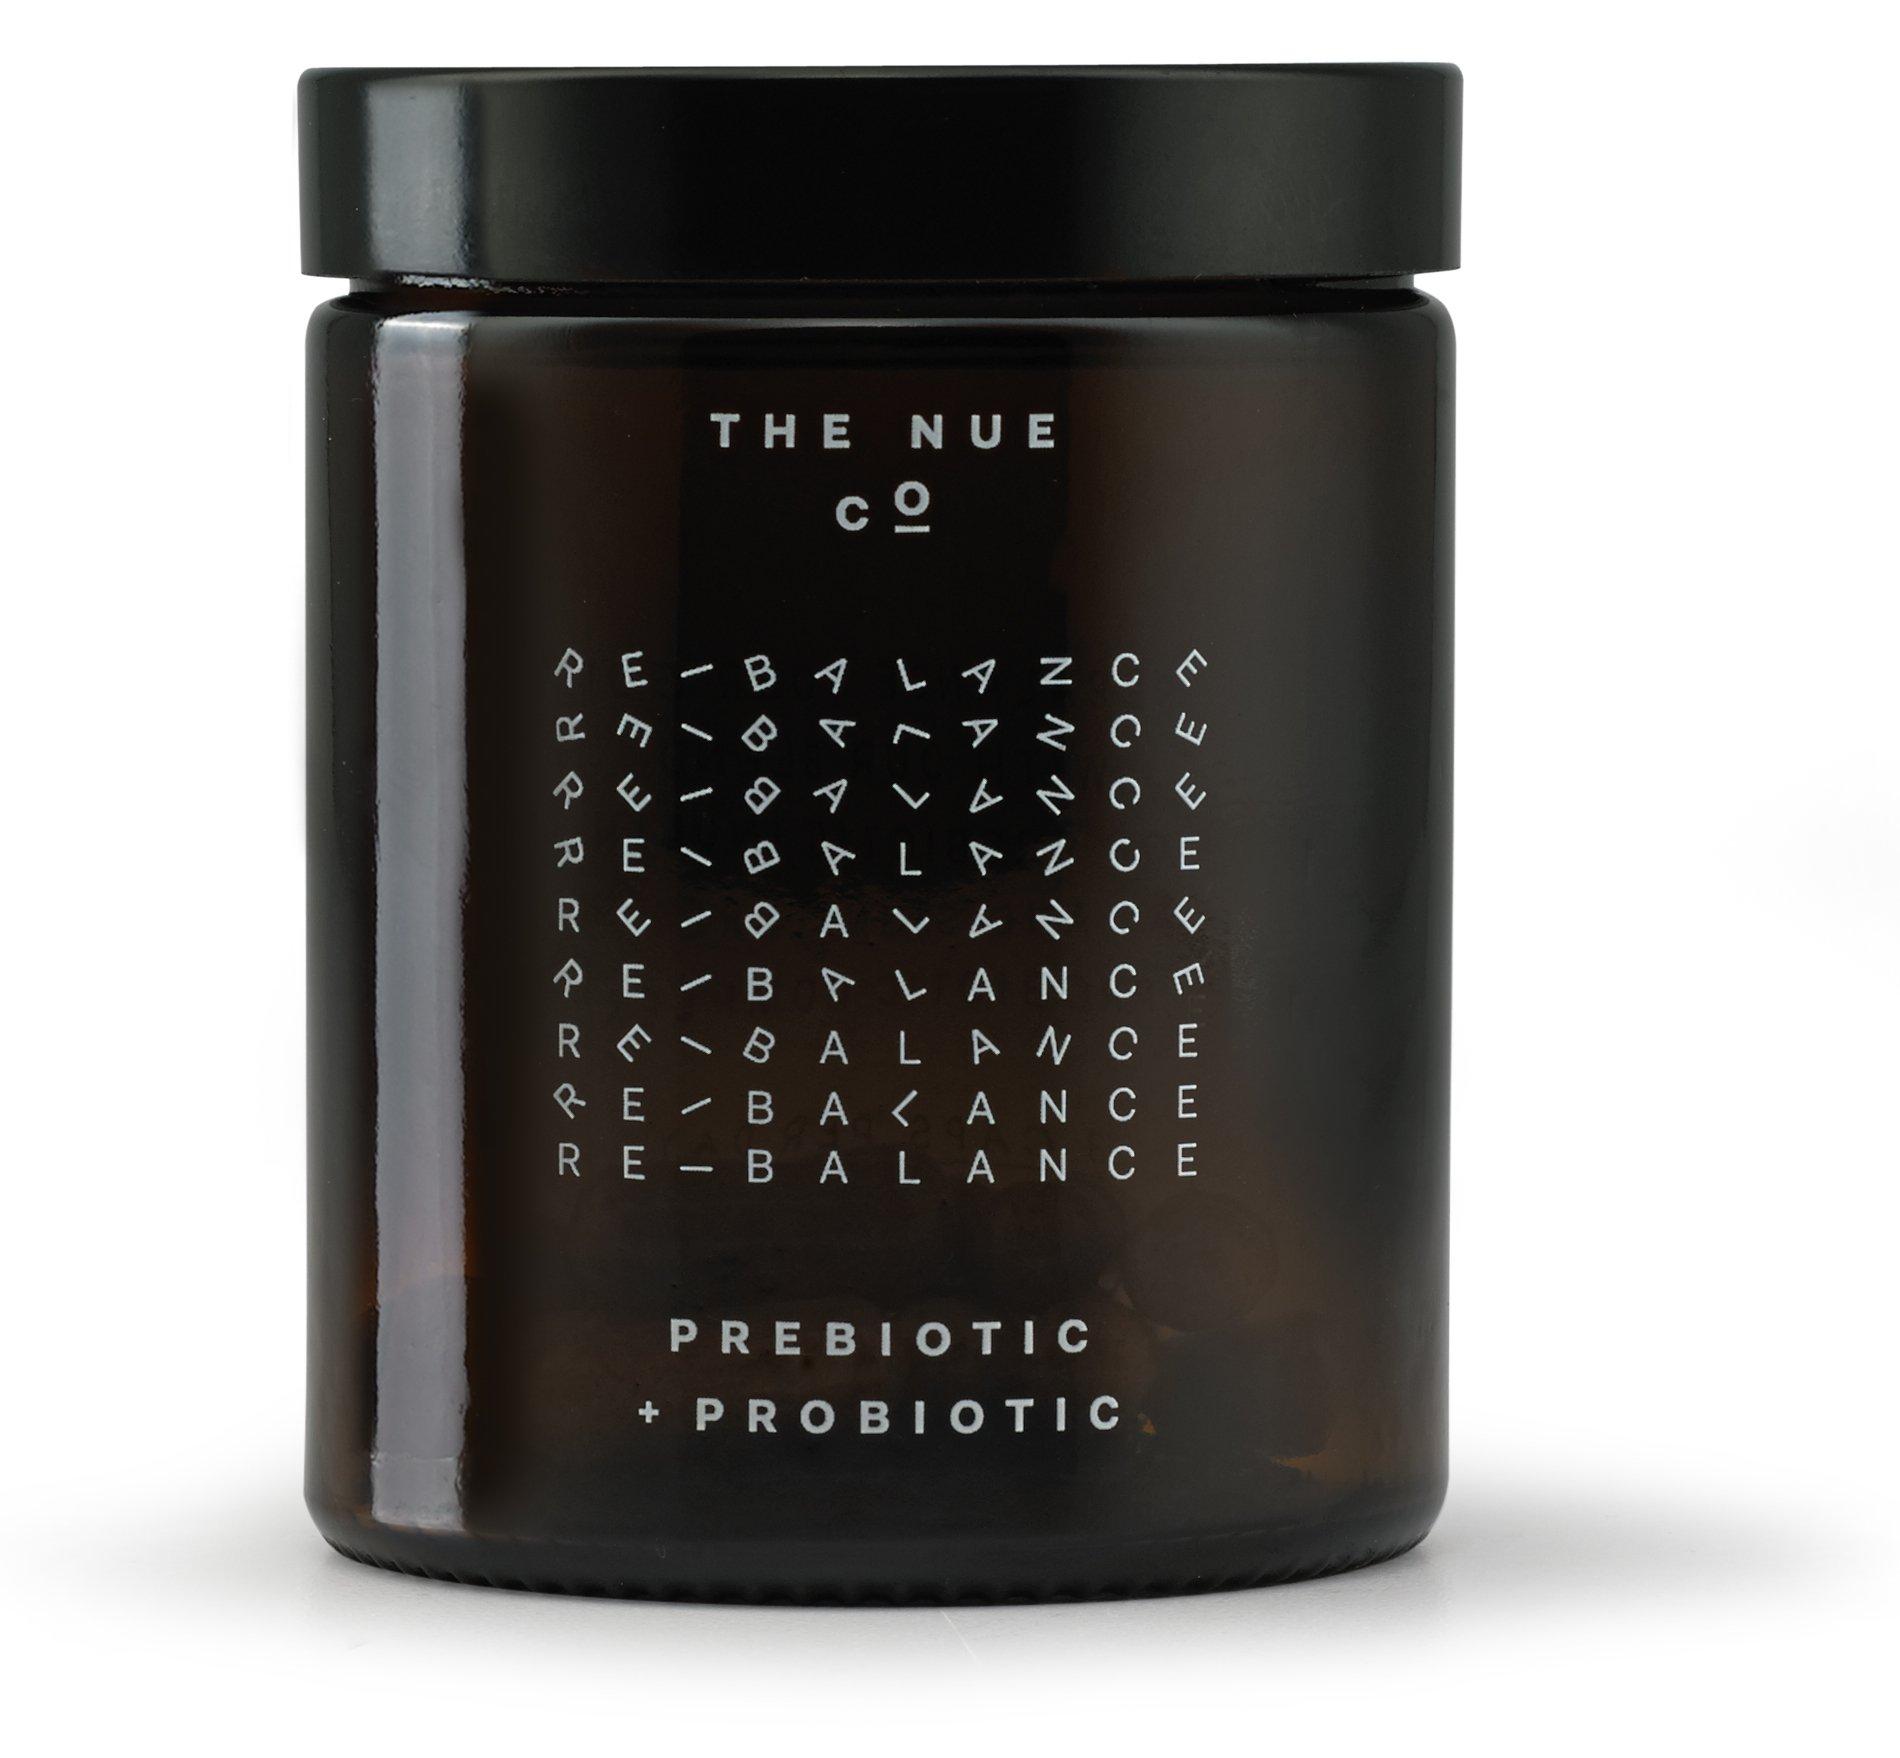 The Nue Co. - All Natural Prebiotic + Probiotic (90 capsules / 100 g)